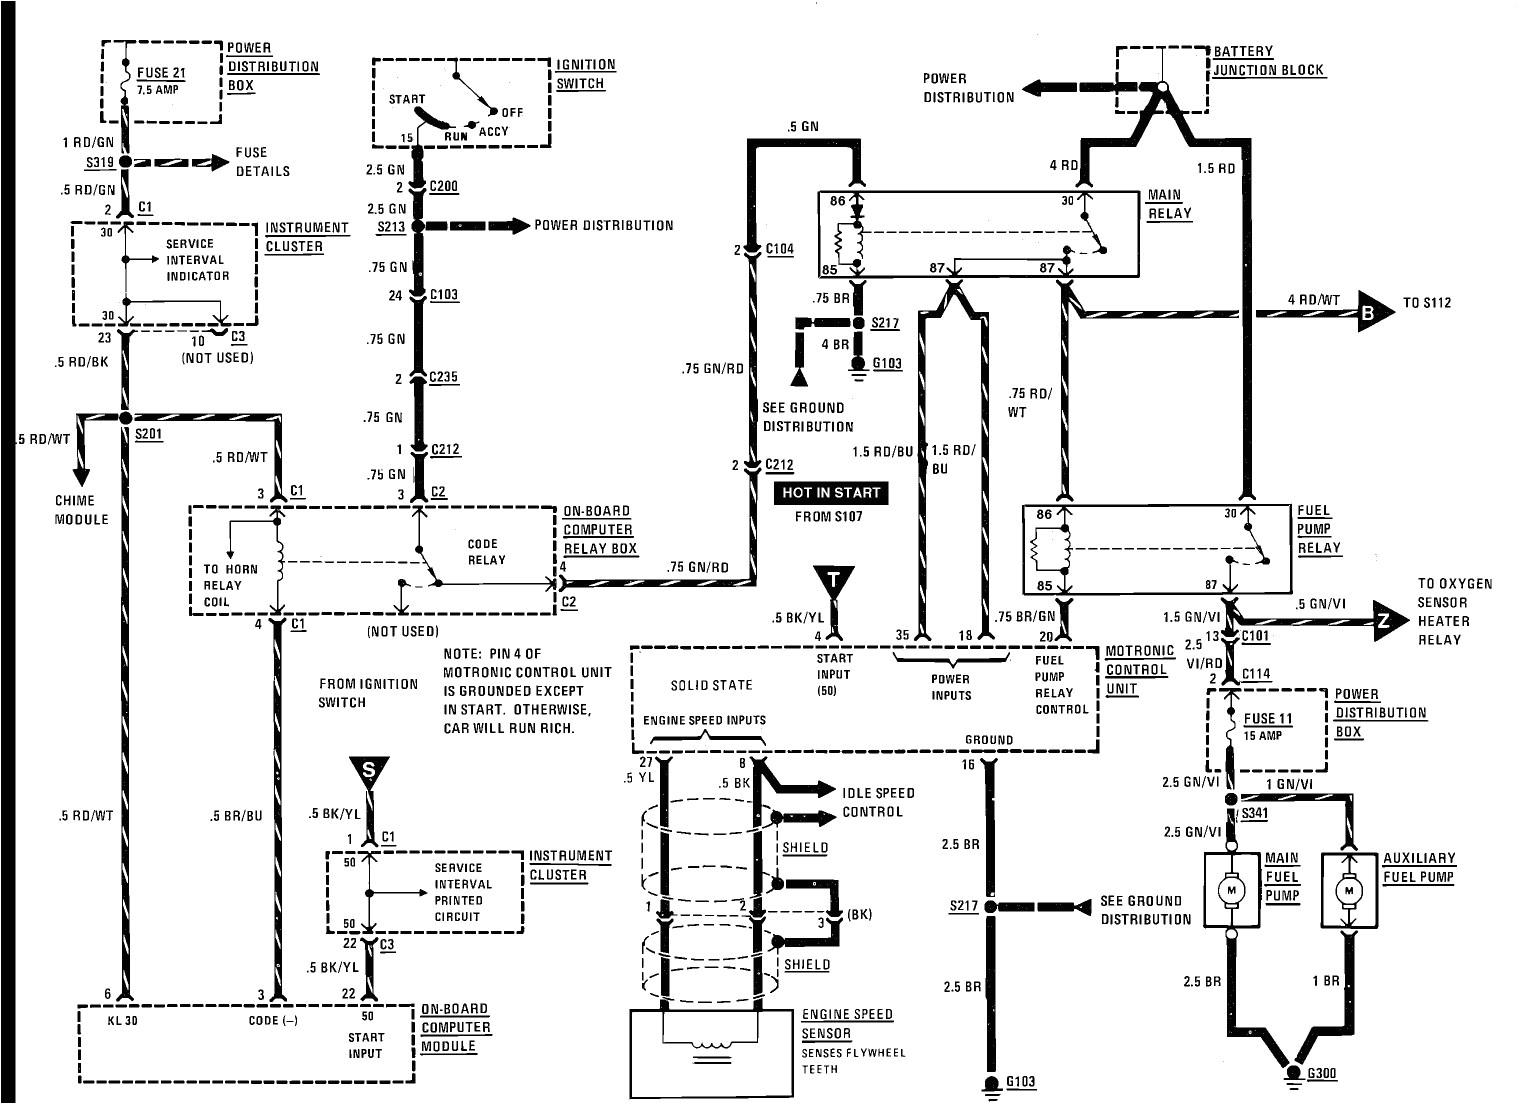 bmw fuel pump wiring diagram premium wiring diagram blog wiring diagram bmw e30 fuel pump relay location 2003 bmw 325i wiring